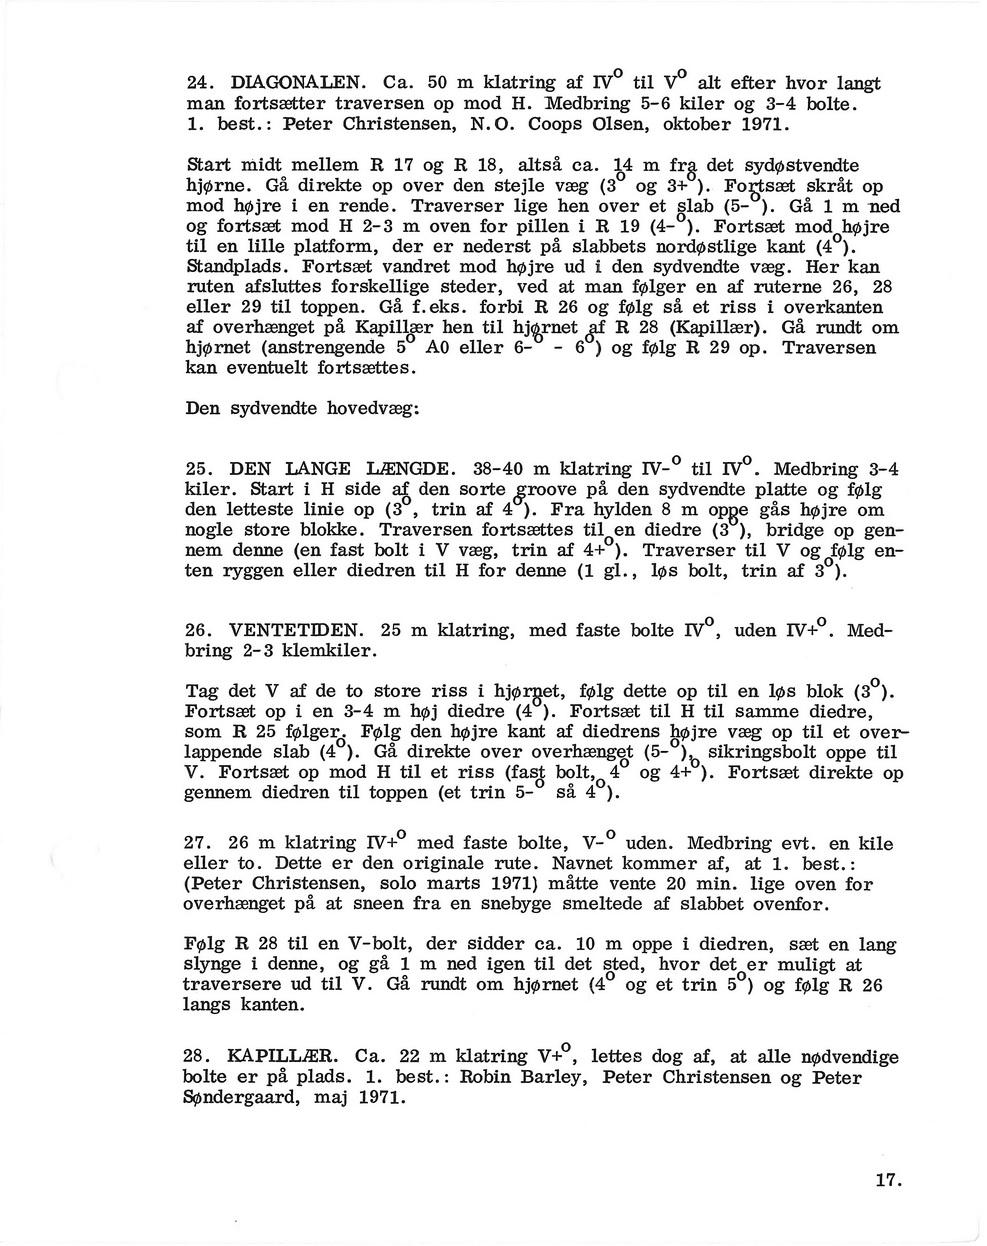 Kullen guide 1972 017.jpg